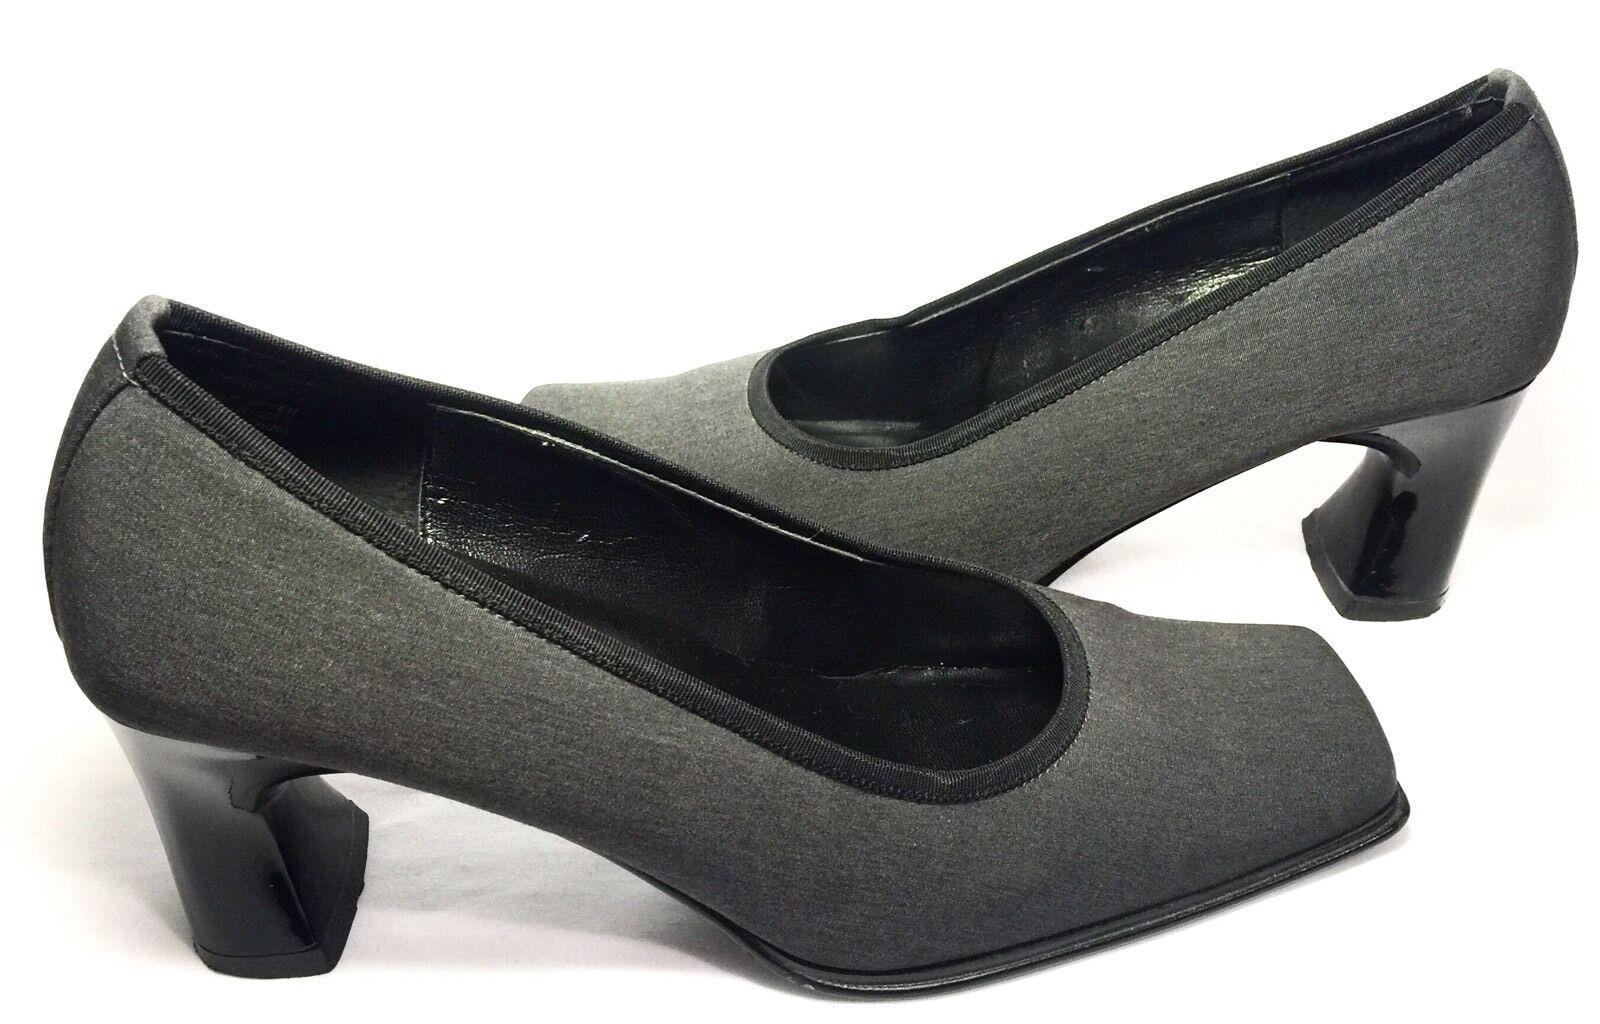 Anne Klein 2 Gray Shoes Square-Toed Heels Pumps Dress Shoes Gray 7.5M. EUC cab405